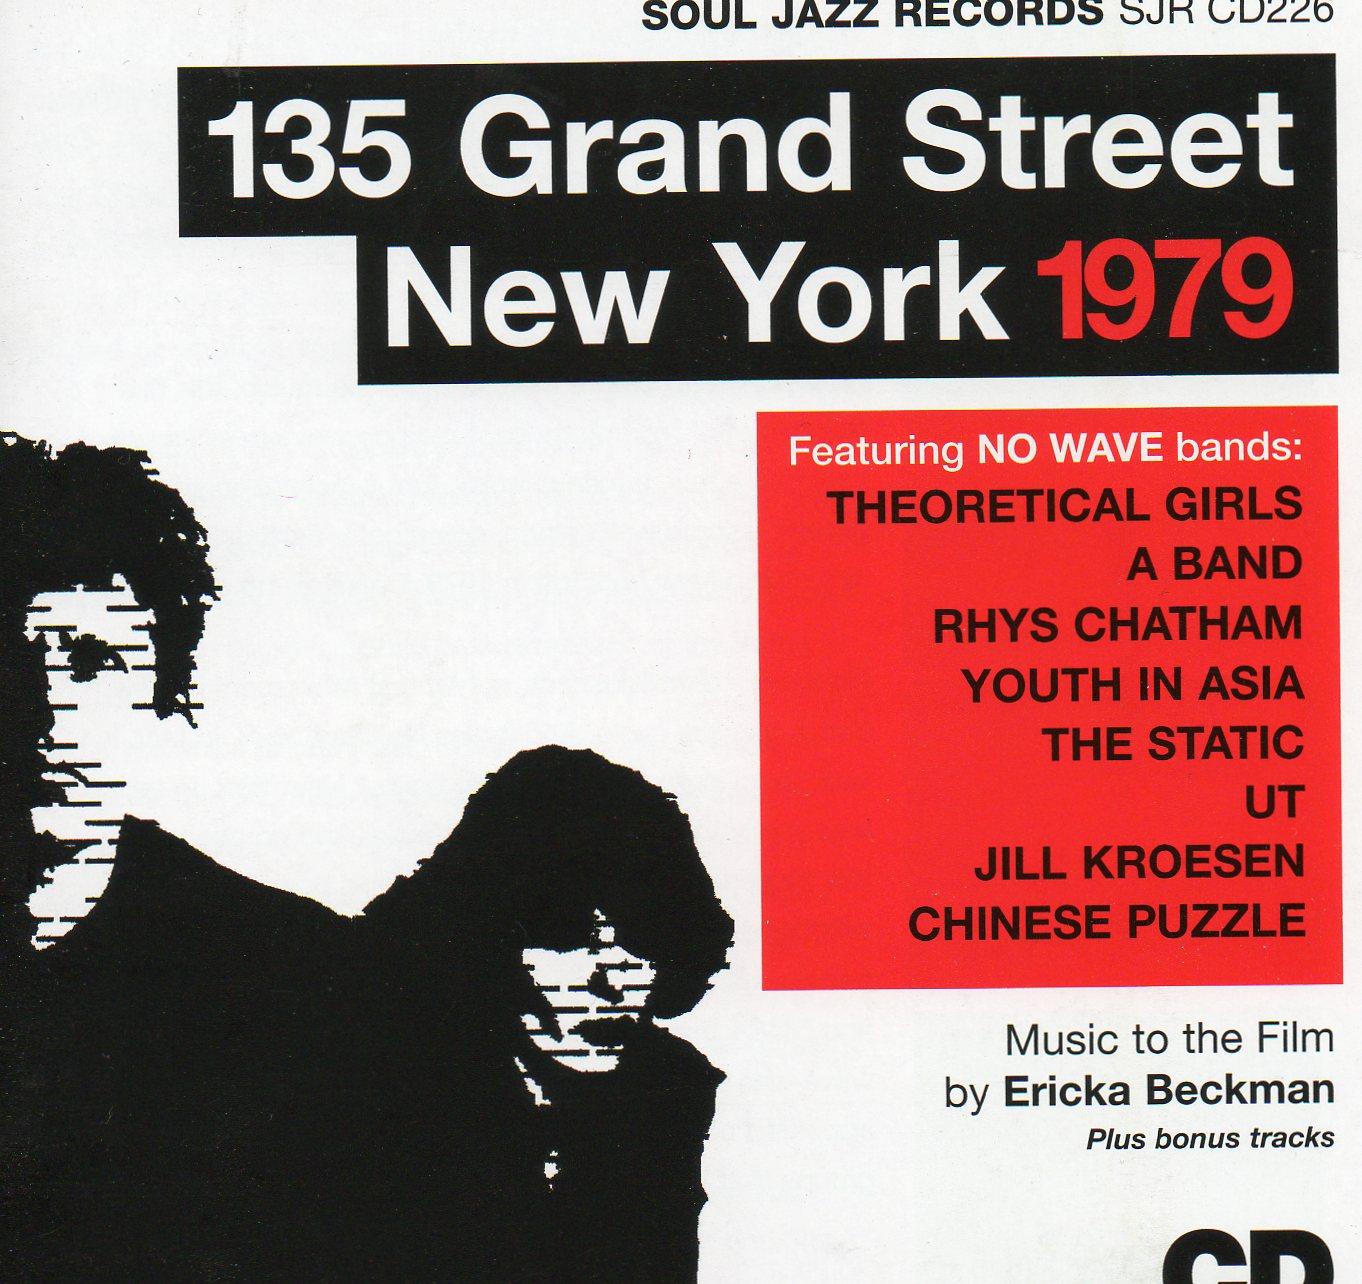 135 Grand Street New York